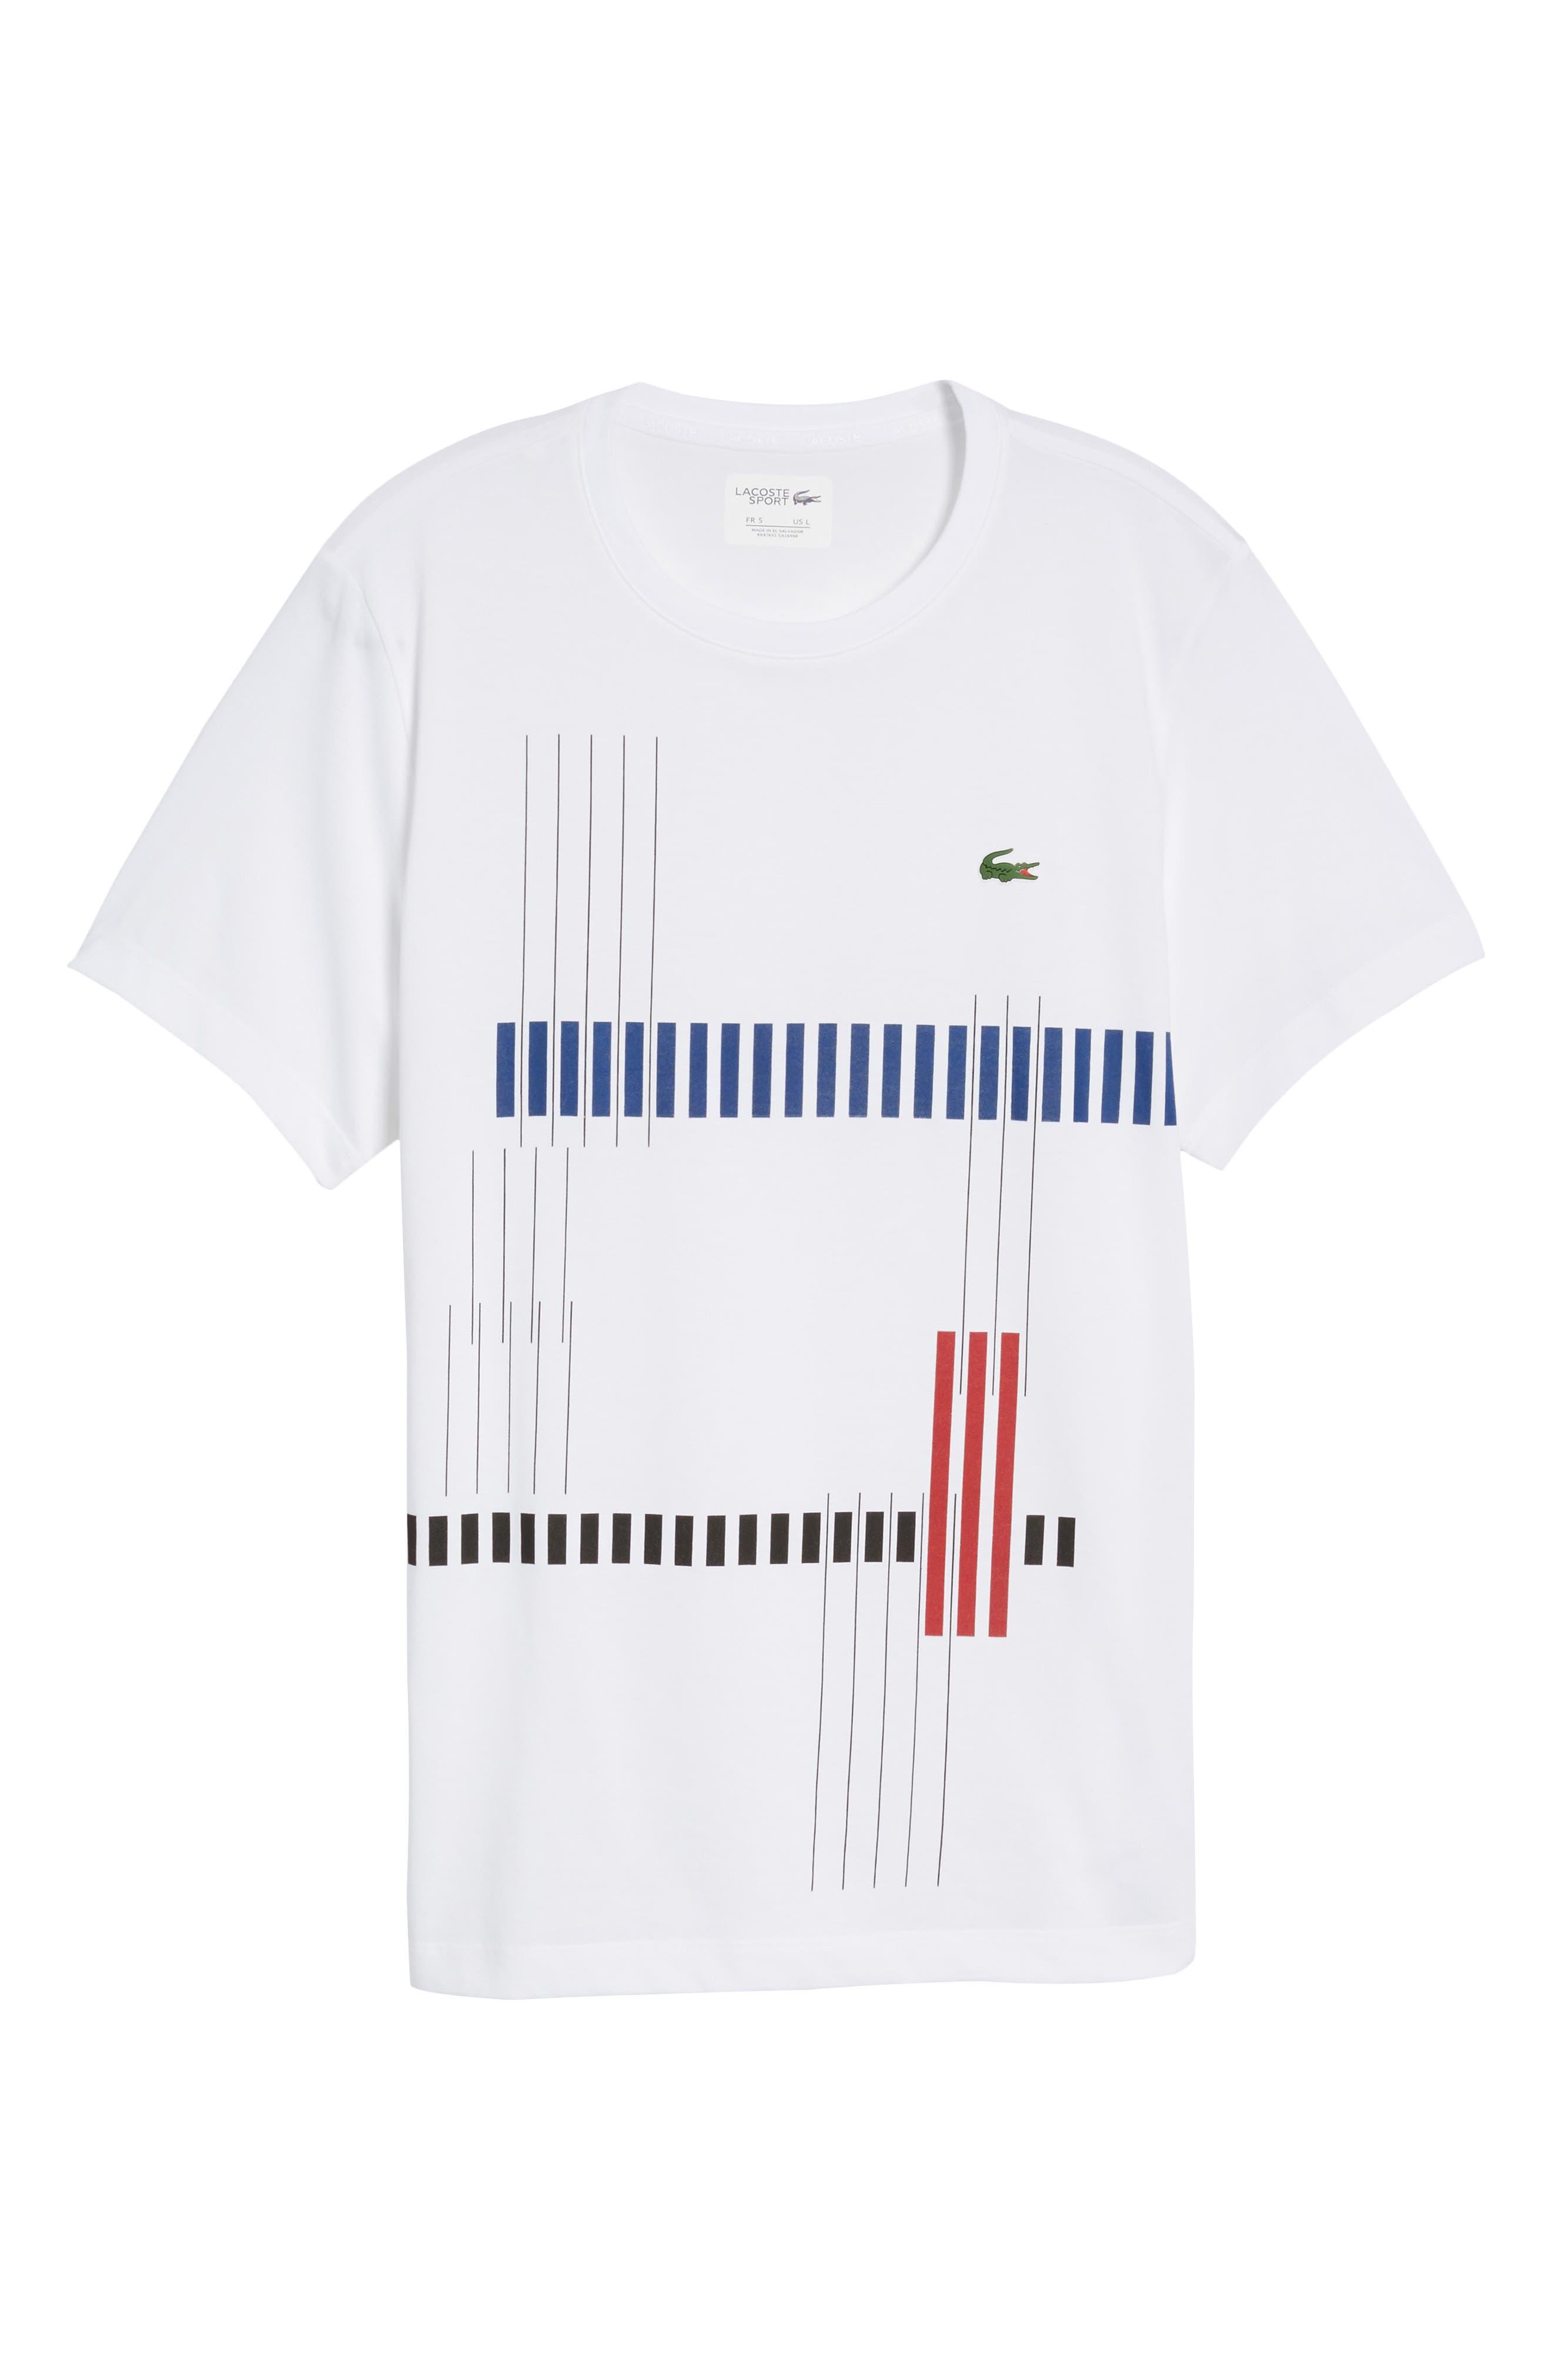 Tech Vertical Stripe Graphic T-Shirt,                             Alternate thumbnail 5, color,                             U88 White/ Ocean-Ladybird-Blac